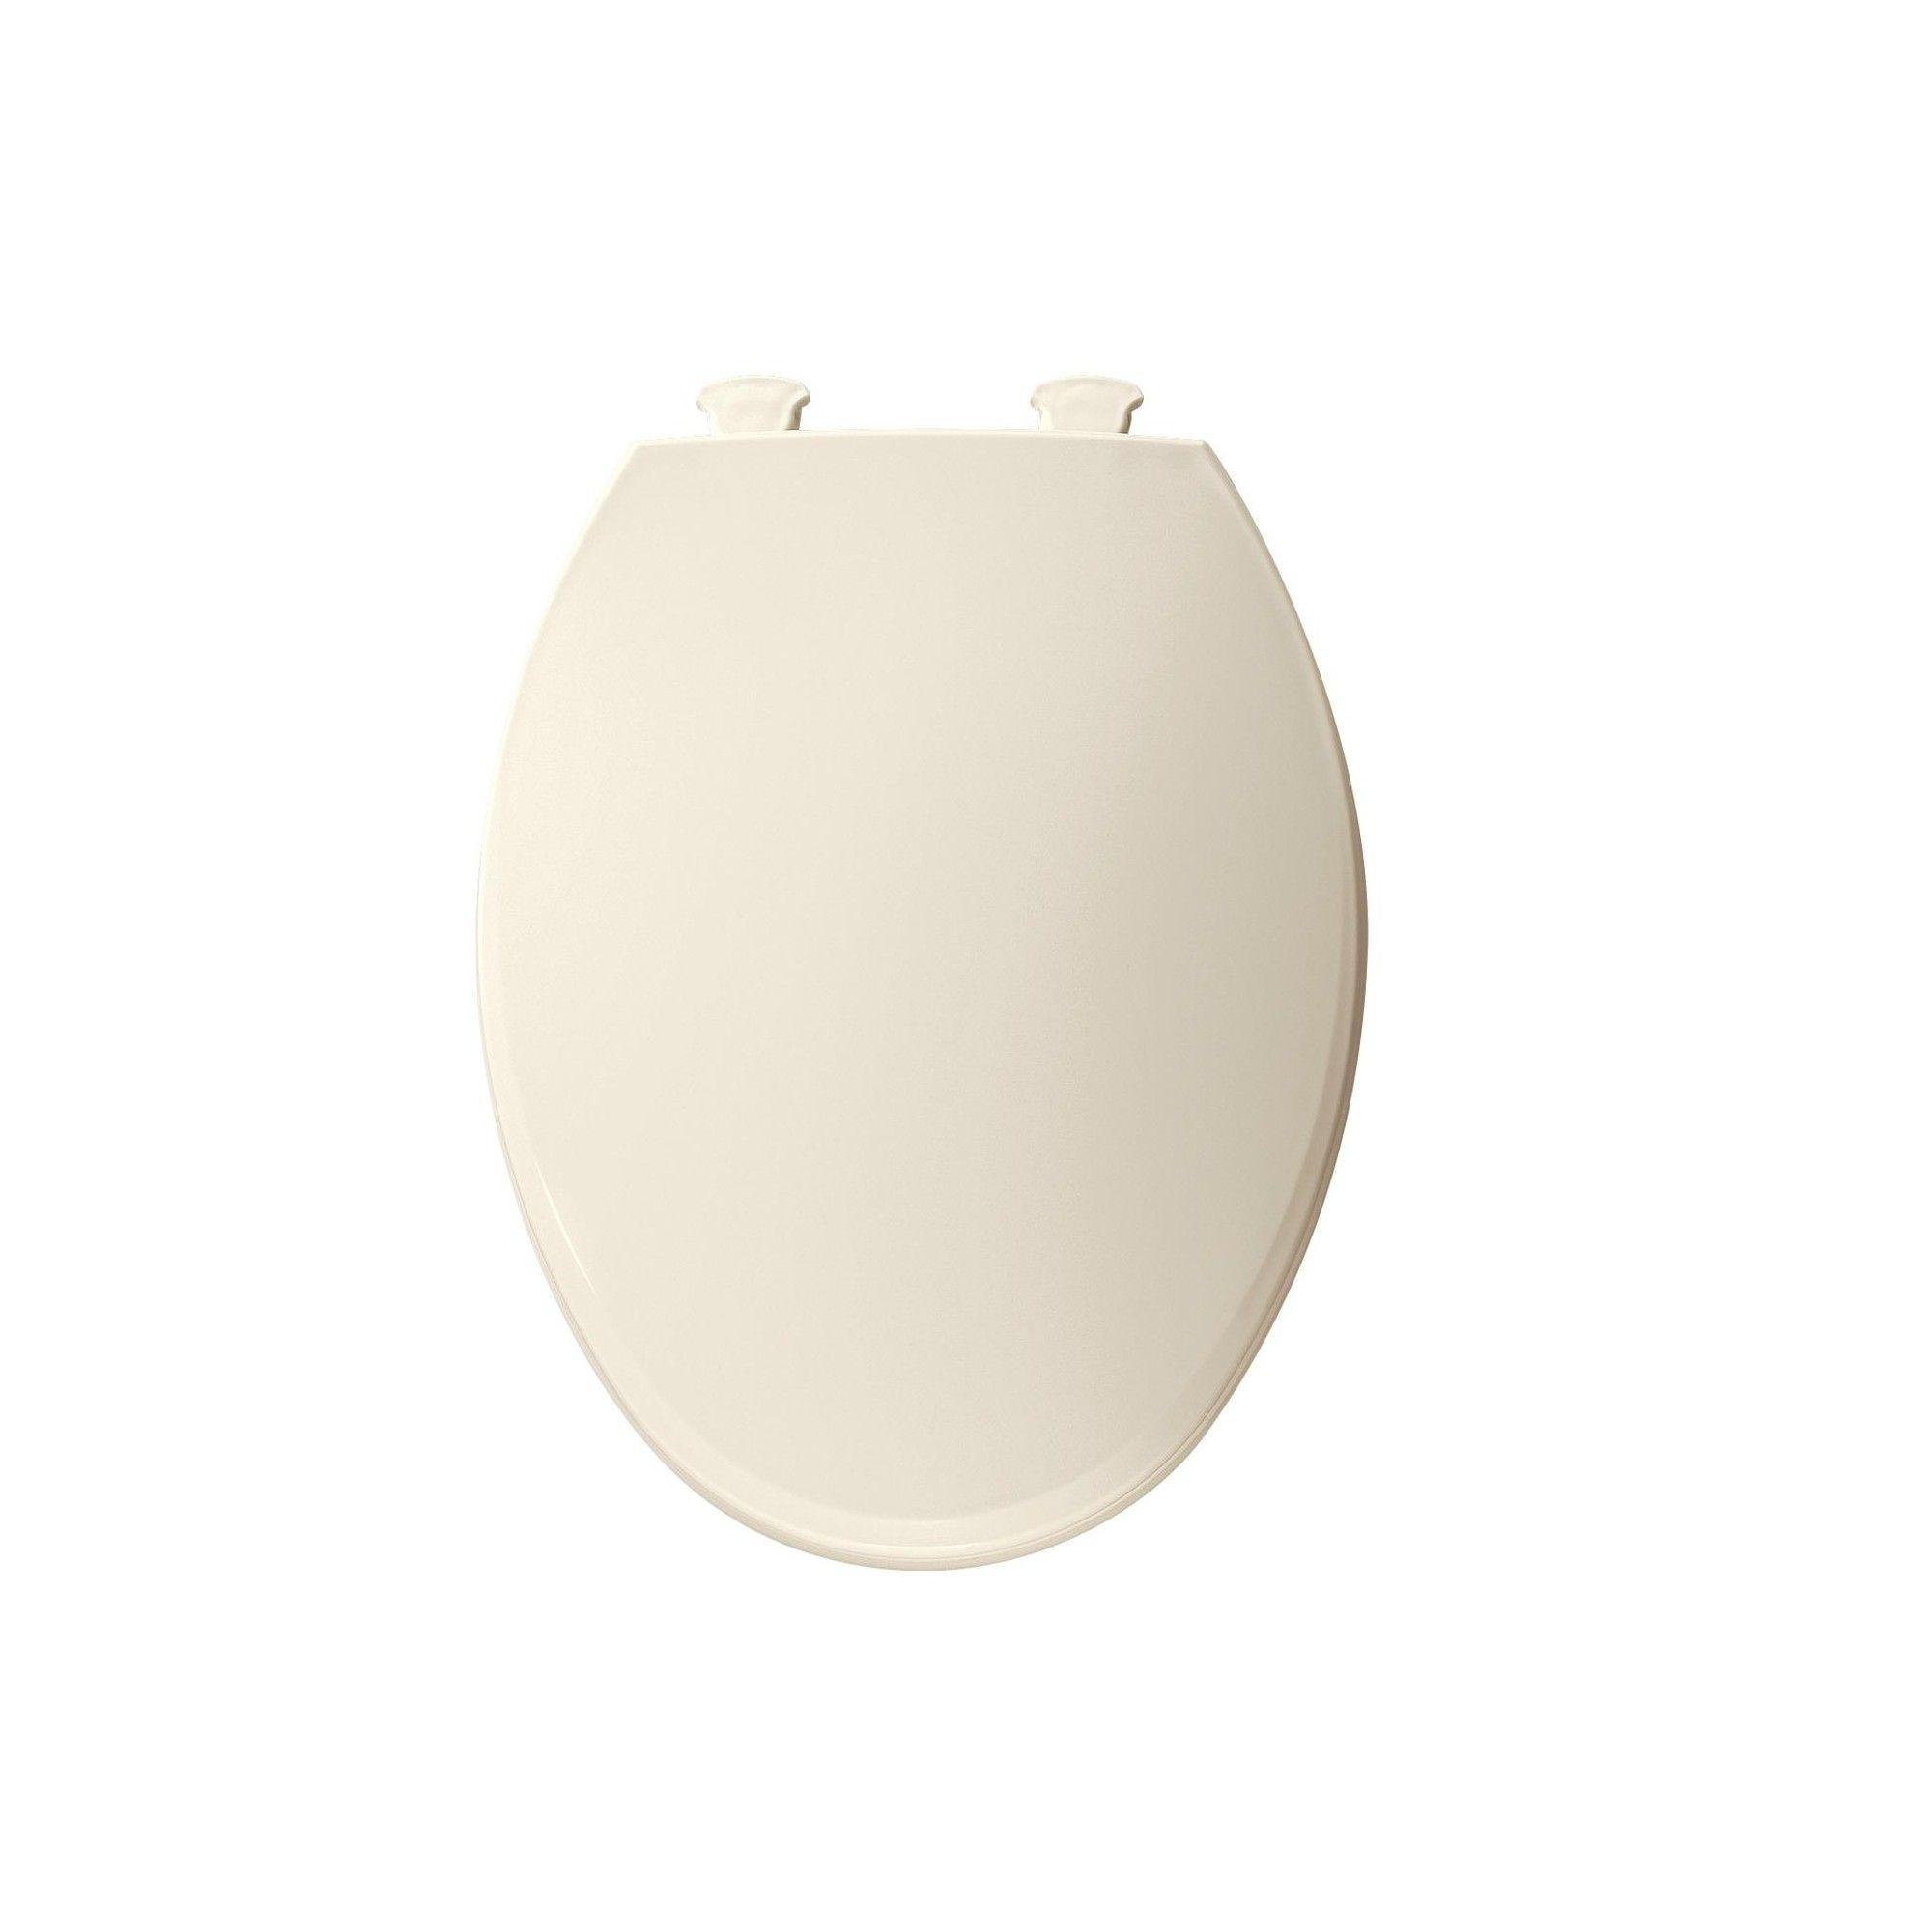 Superb Bemis 1800Ec Elongated Plastic Toilet Seat With Easy Clean Dailytribune Chair Design For Home Dailytribuneorg